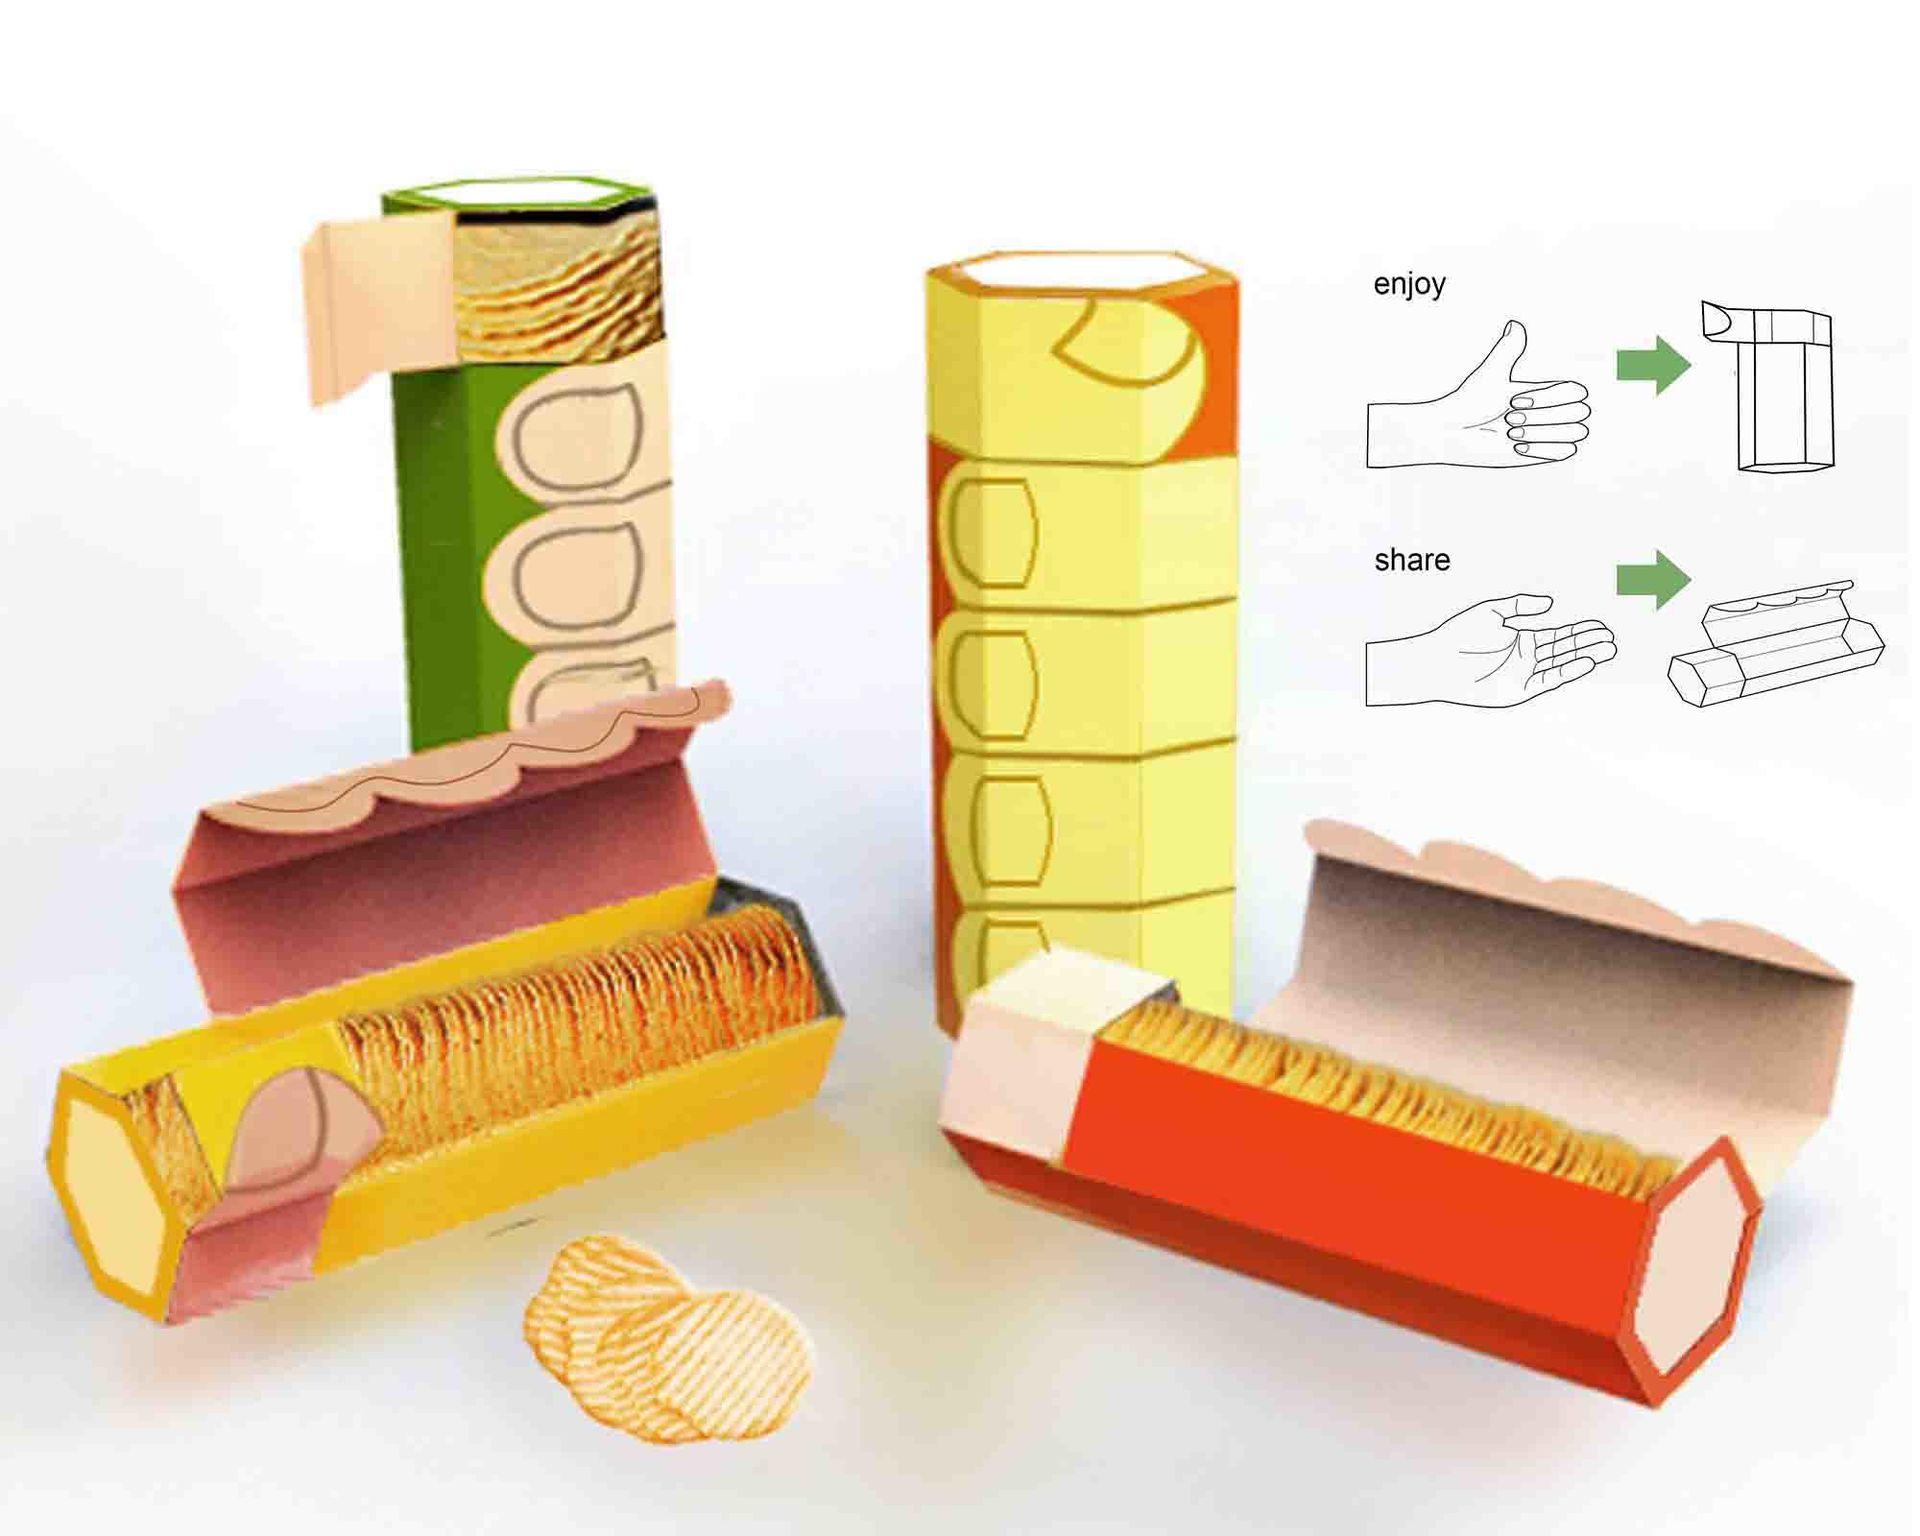 Chip clipart finger chip. Potato chips box entry